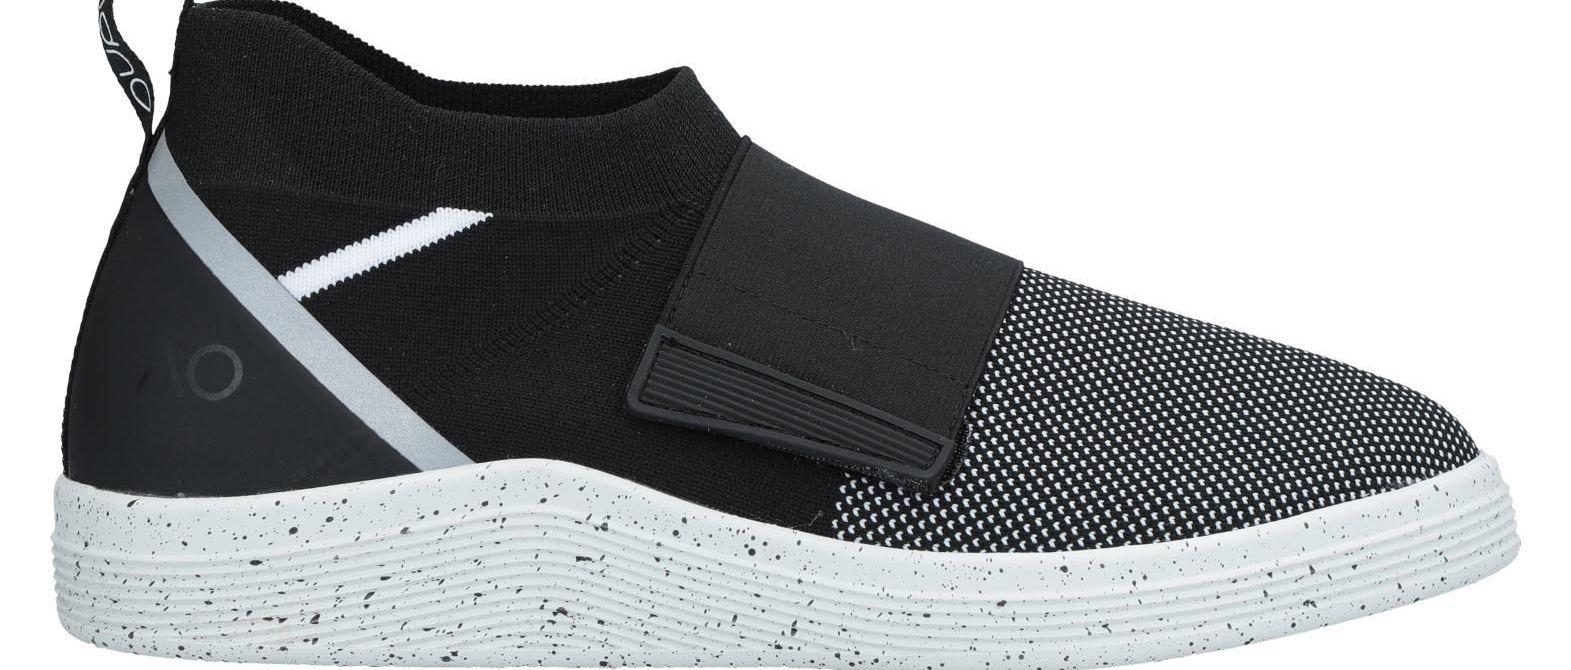 ADNO® ΠΑΠΟΥΤΣΙΑ Παπούτσια τένις χαμηλά